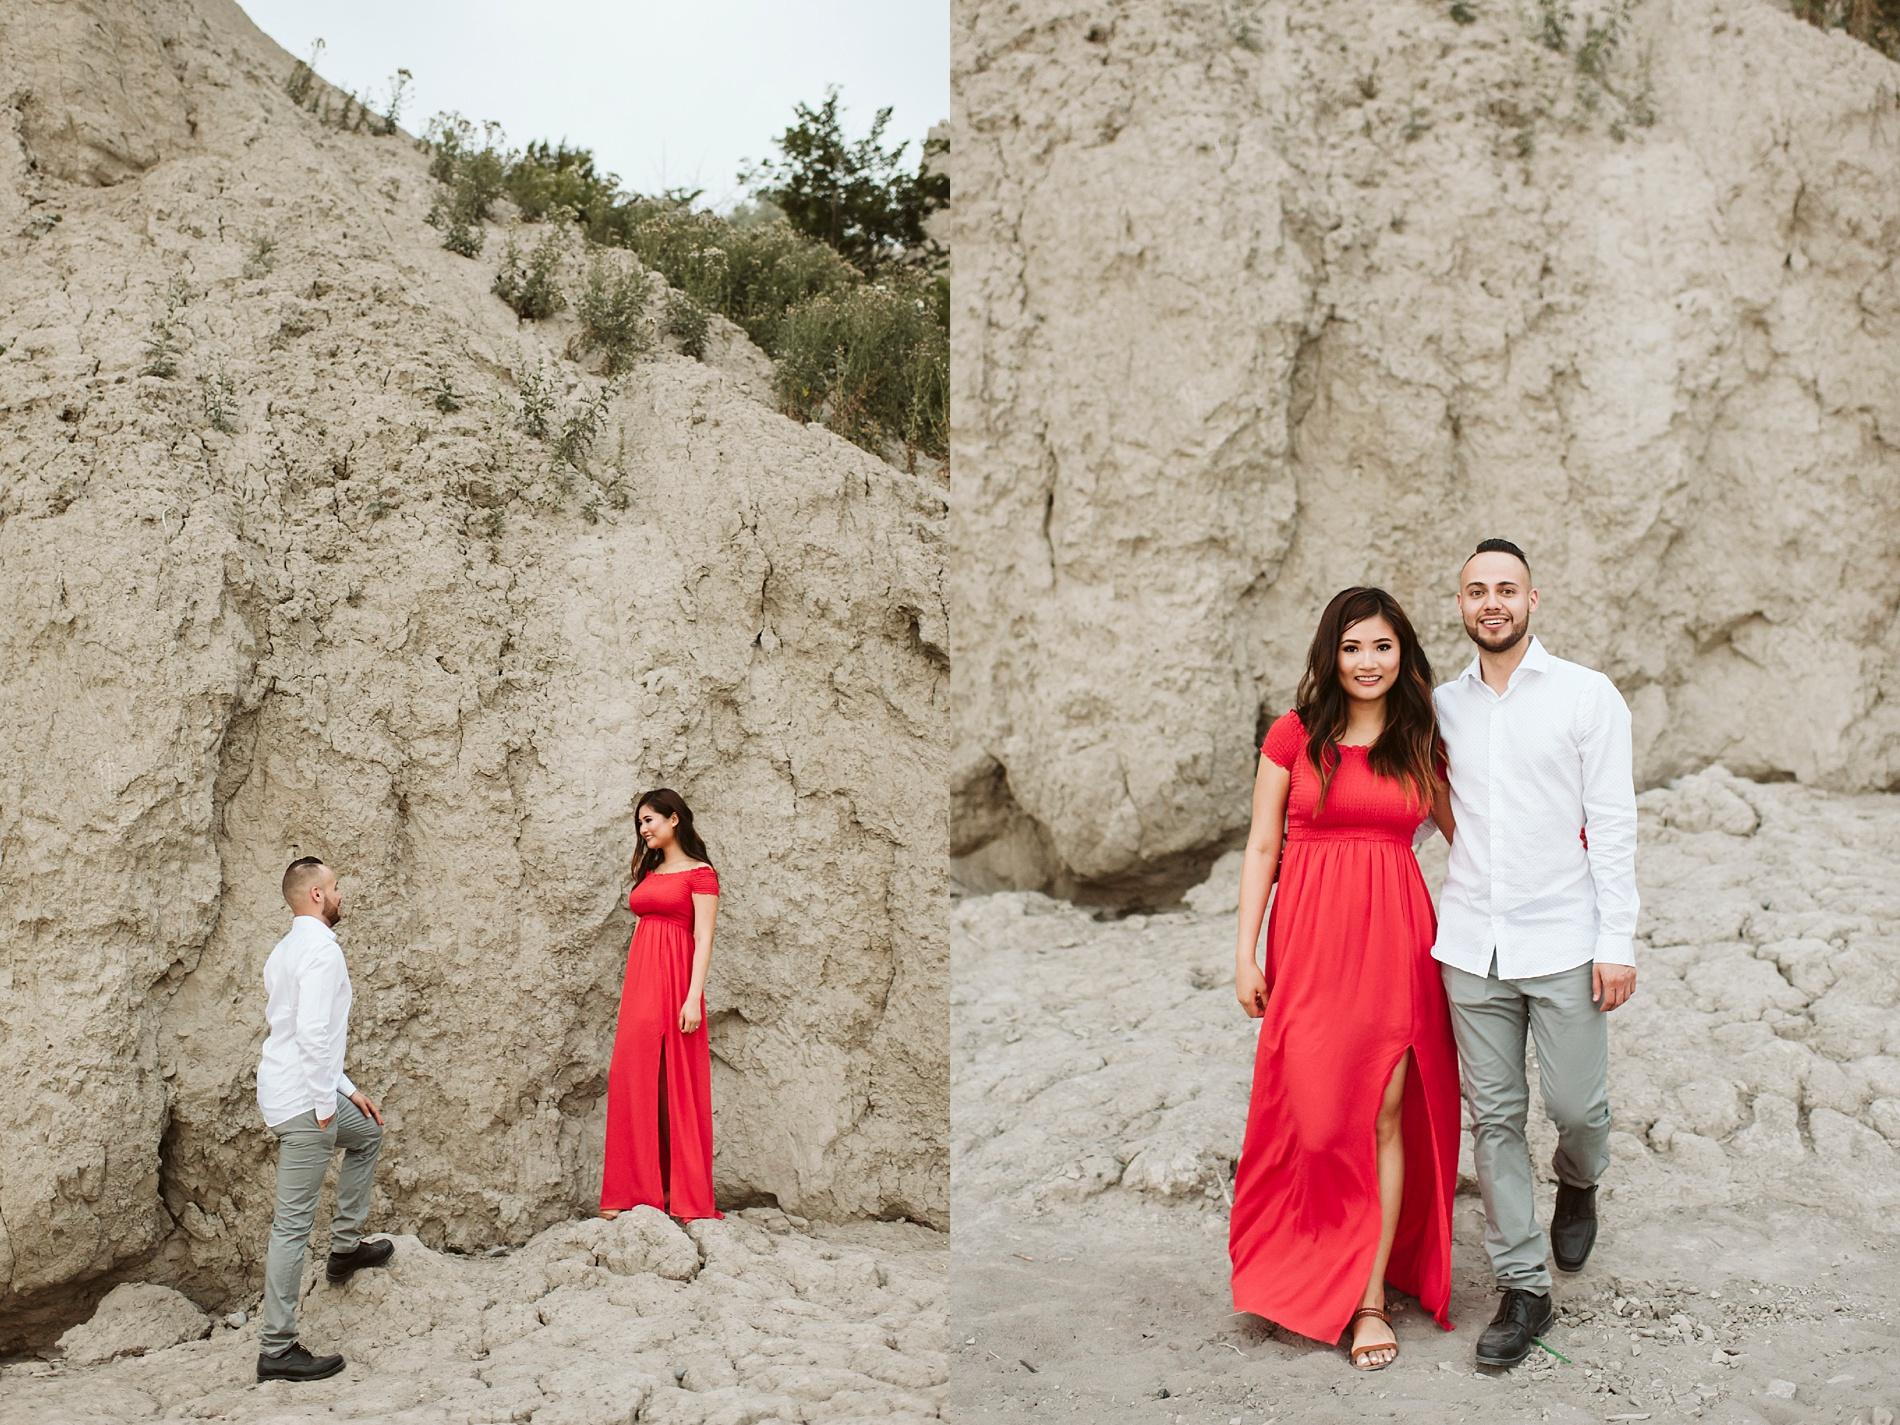 Scarborough_Bluffs_engagement_shoot_Best_Toronto_Wedding_Photographers_0016.jpg